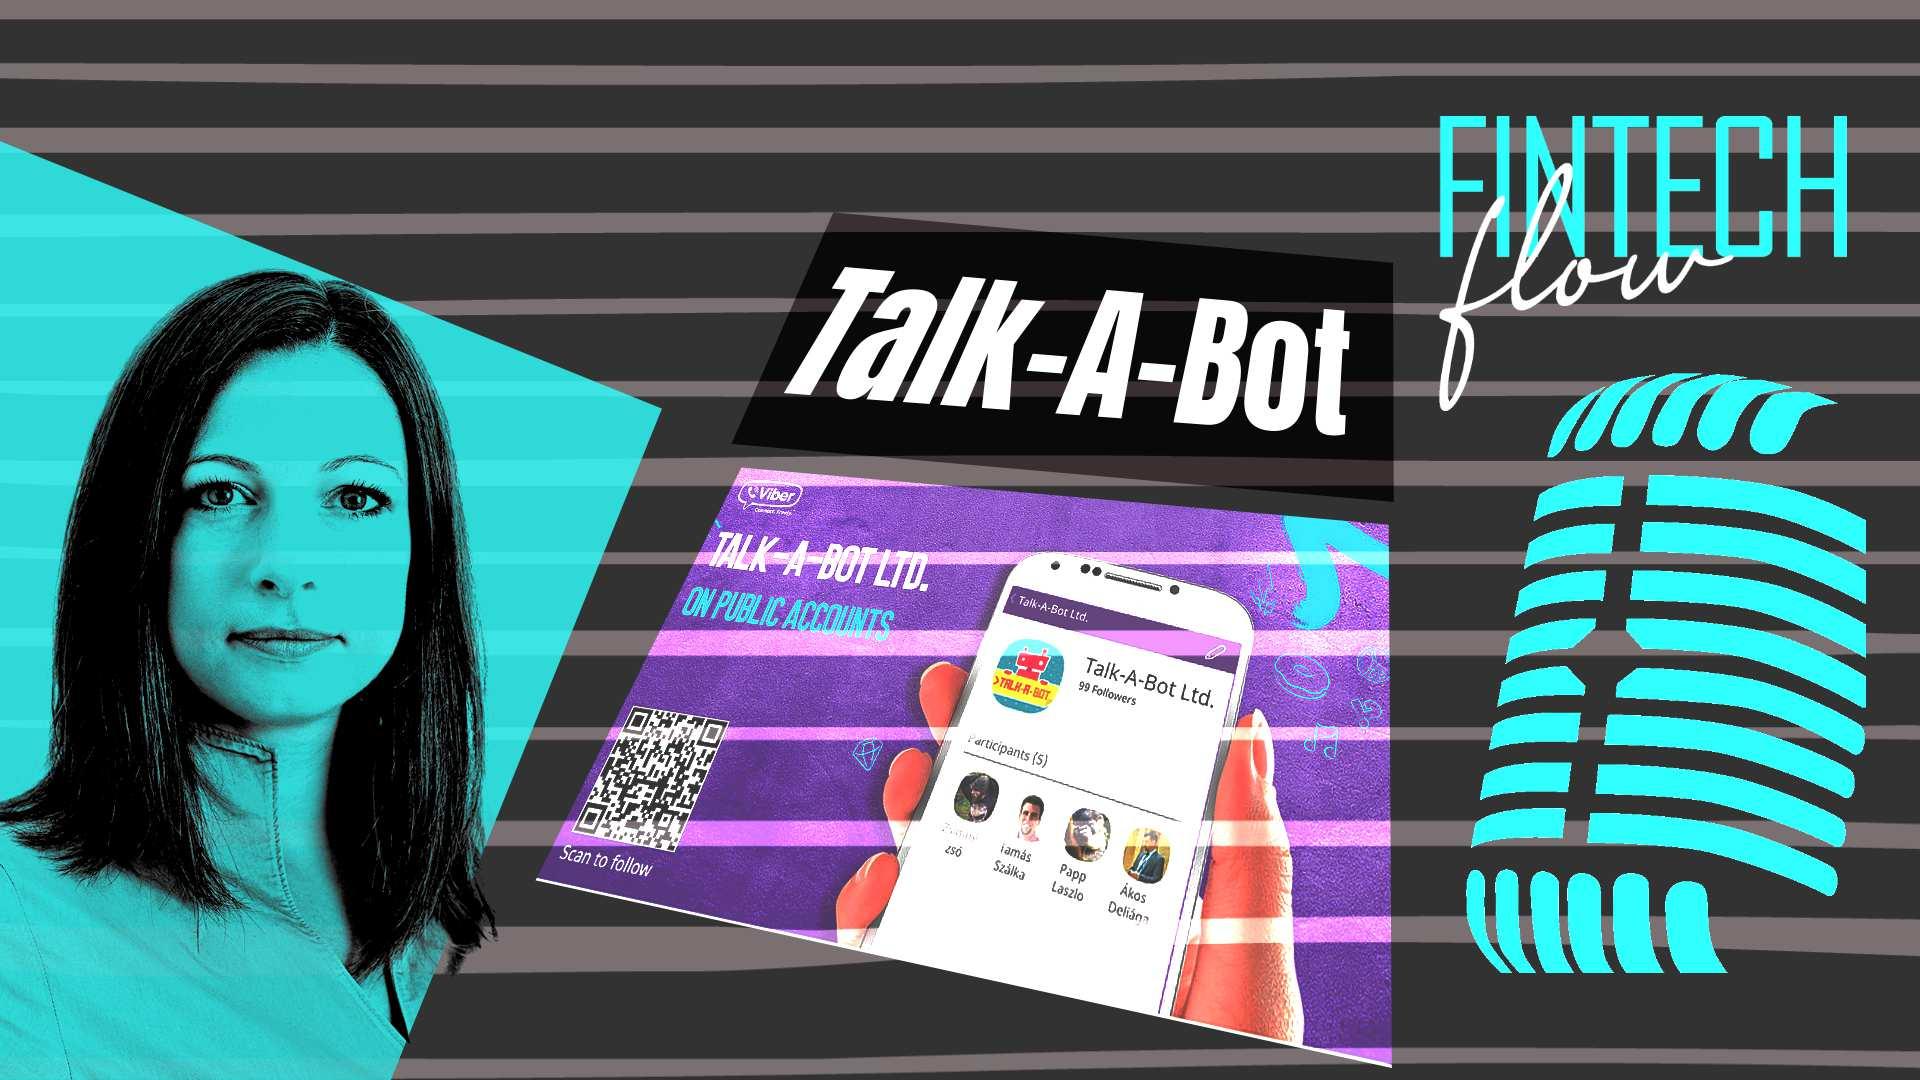 fintechflow-design-posdcast-4-talk-a-bot